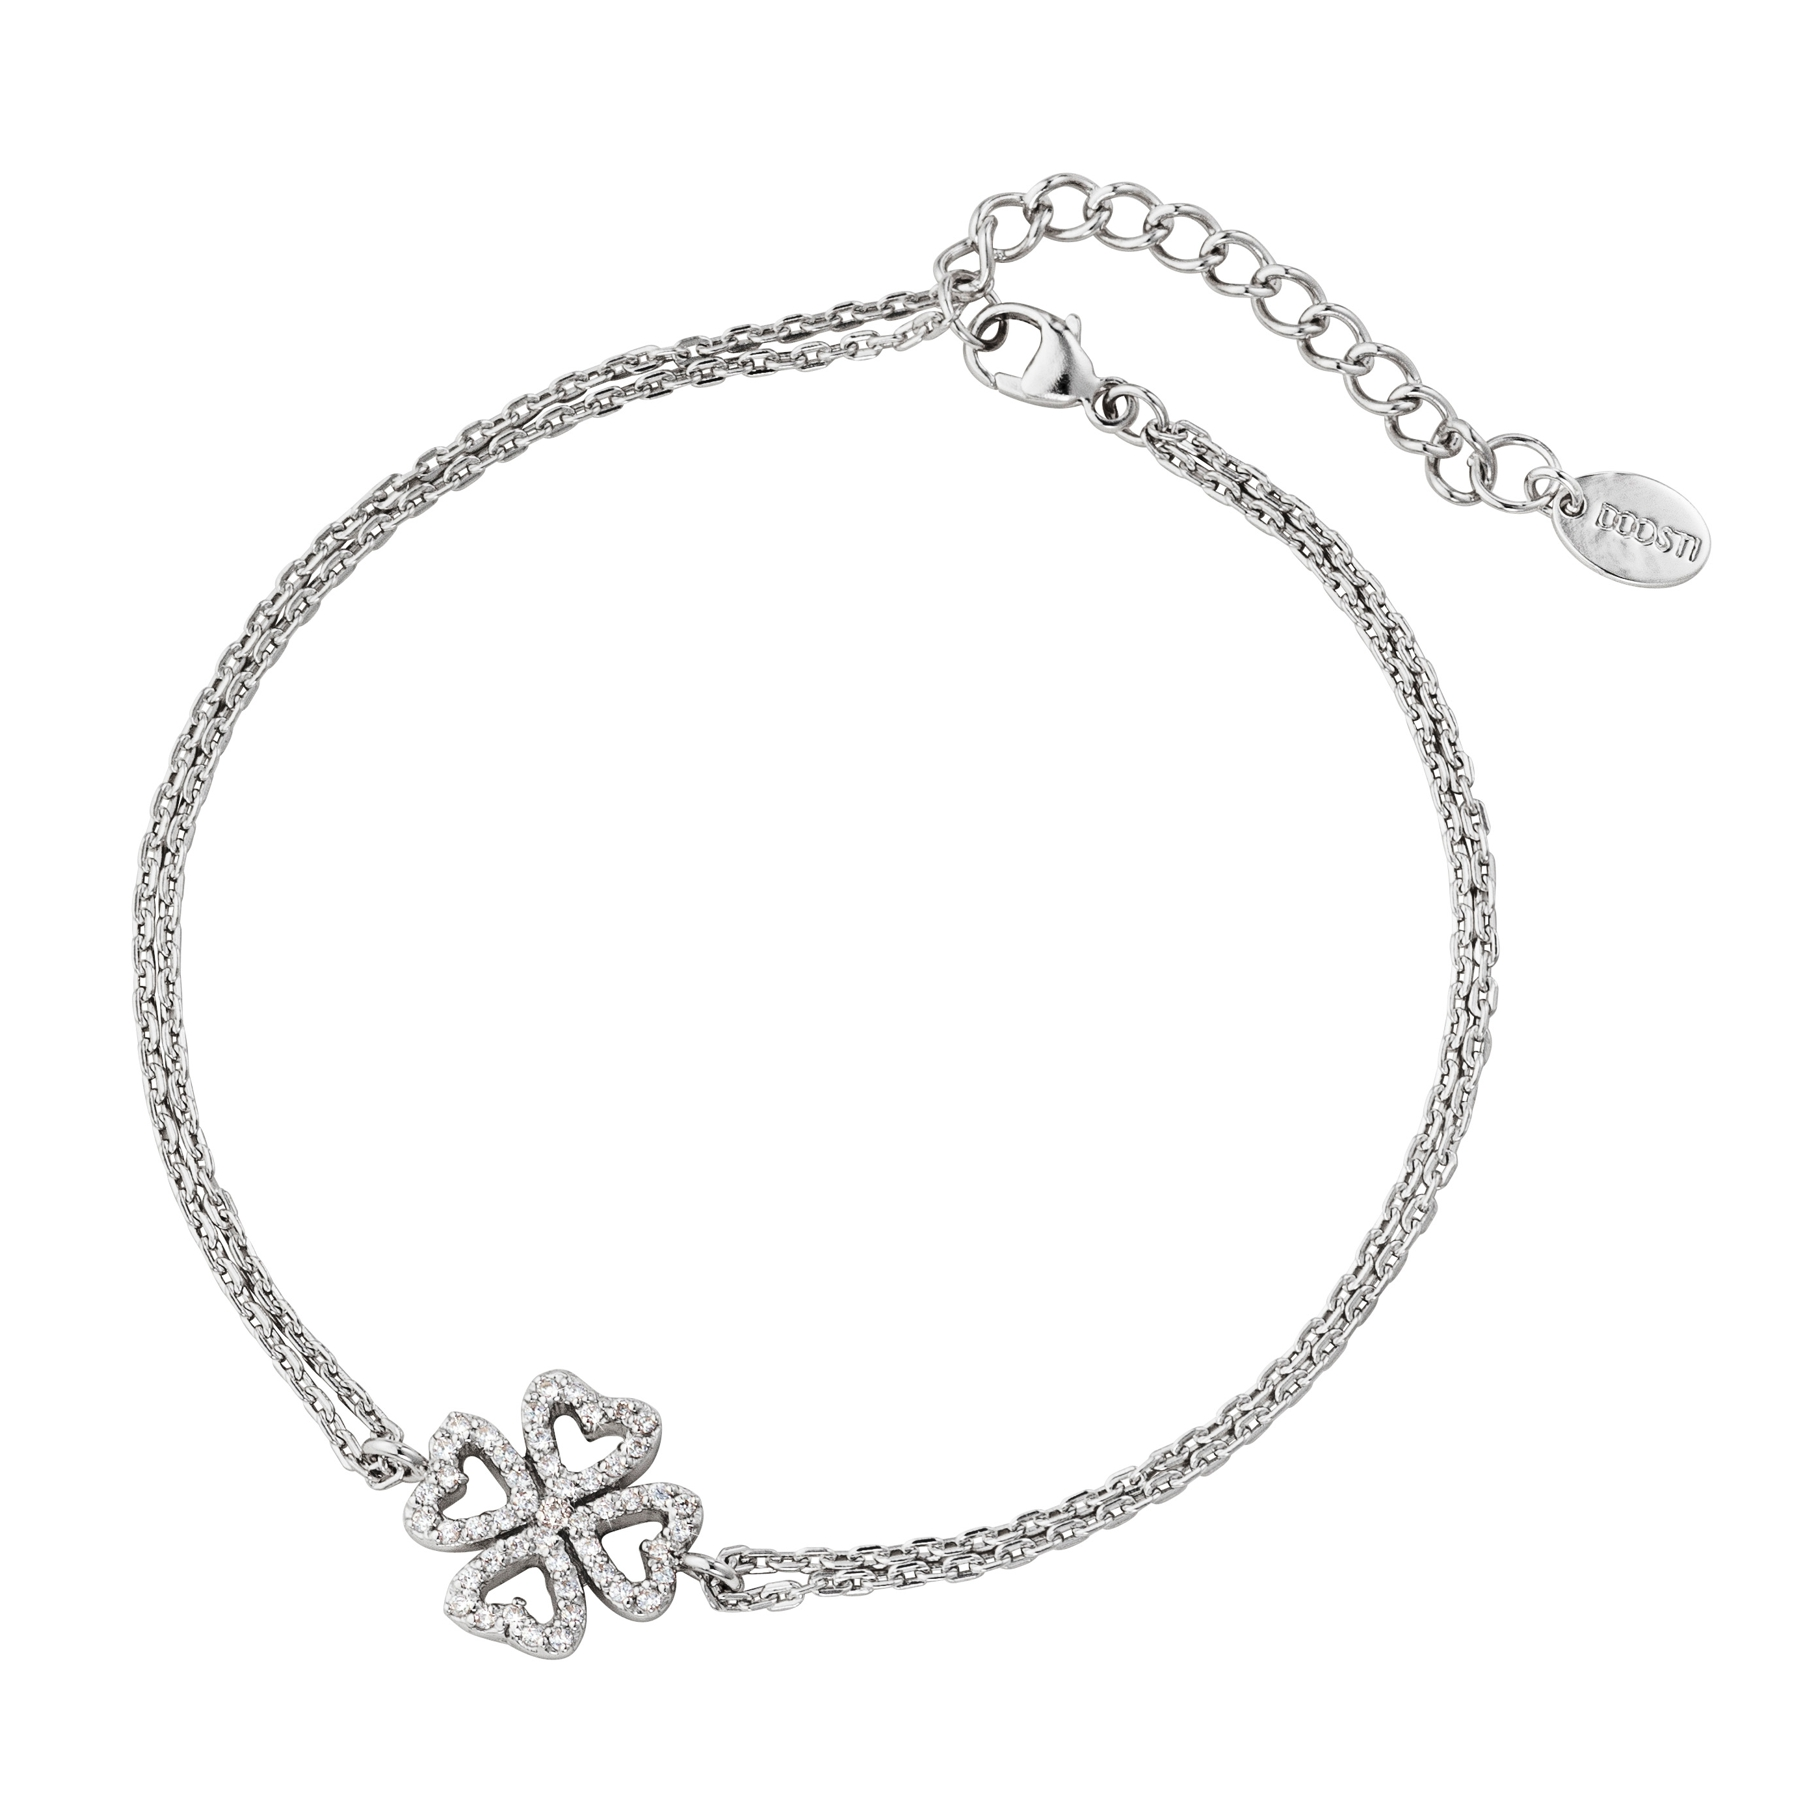 54b29032bee7 DOOSTI Zartes Armband Kleeblatt 925 Silber rhodiniert